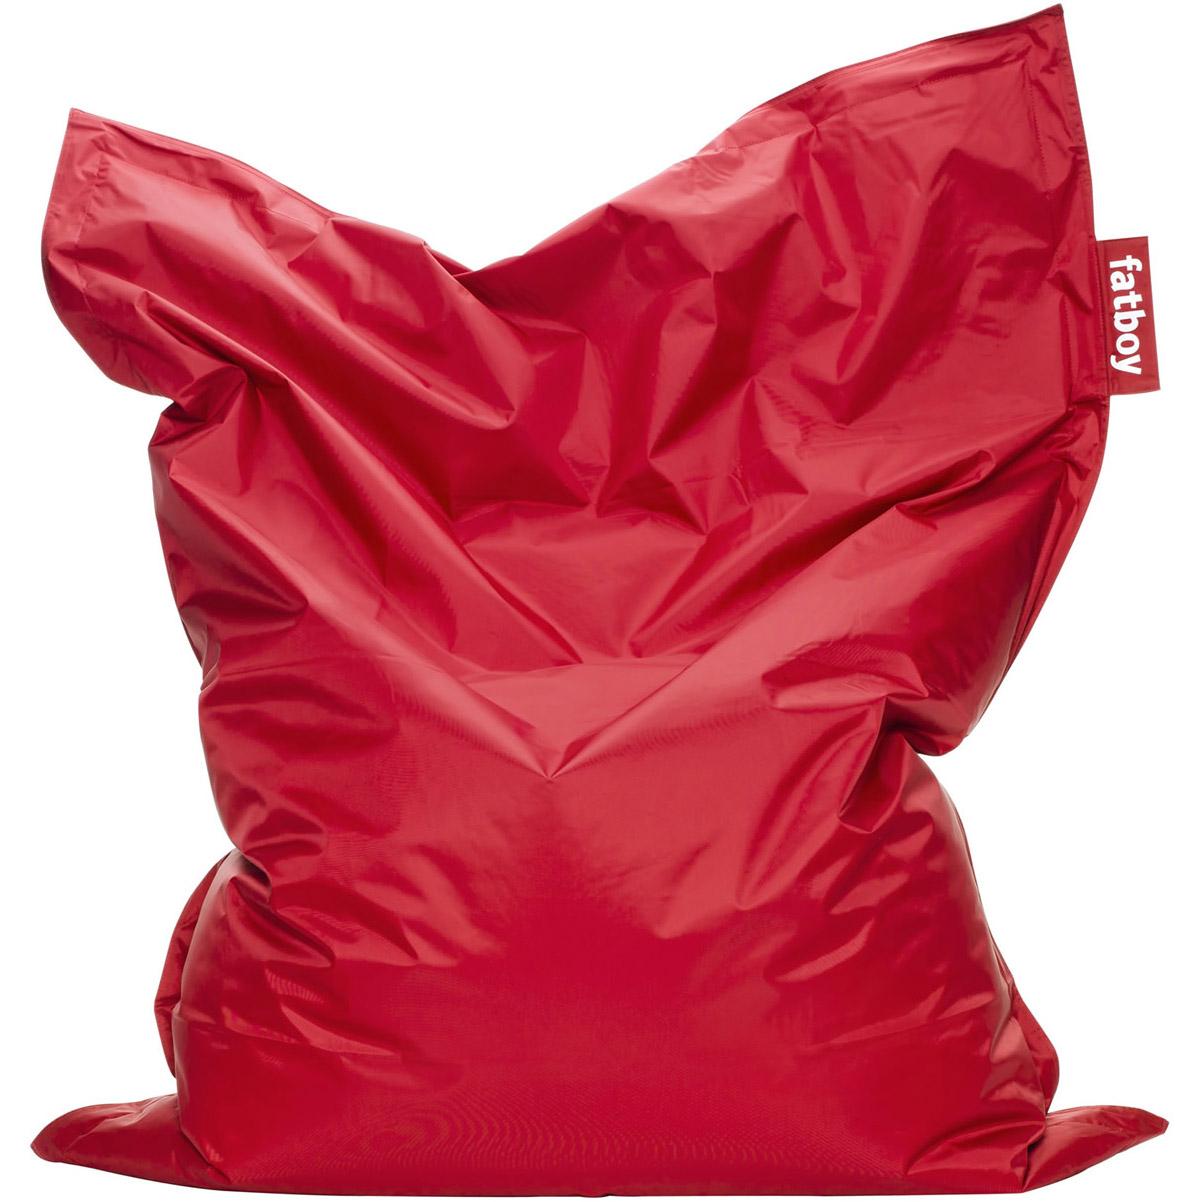 fatboy the original rot bei sitzsack ch kaufen. Black Bedroom Furniture Sets. Home Design Ideas